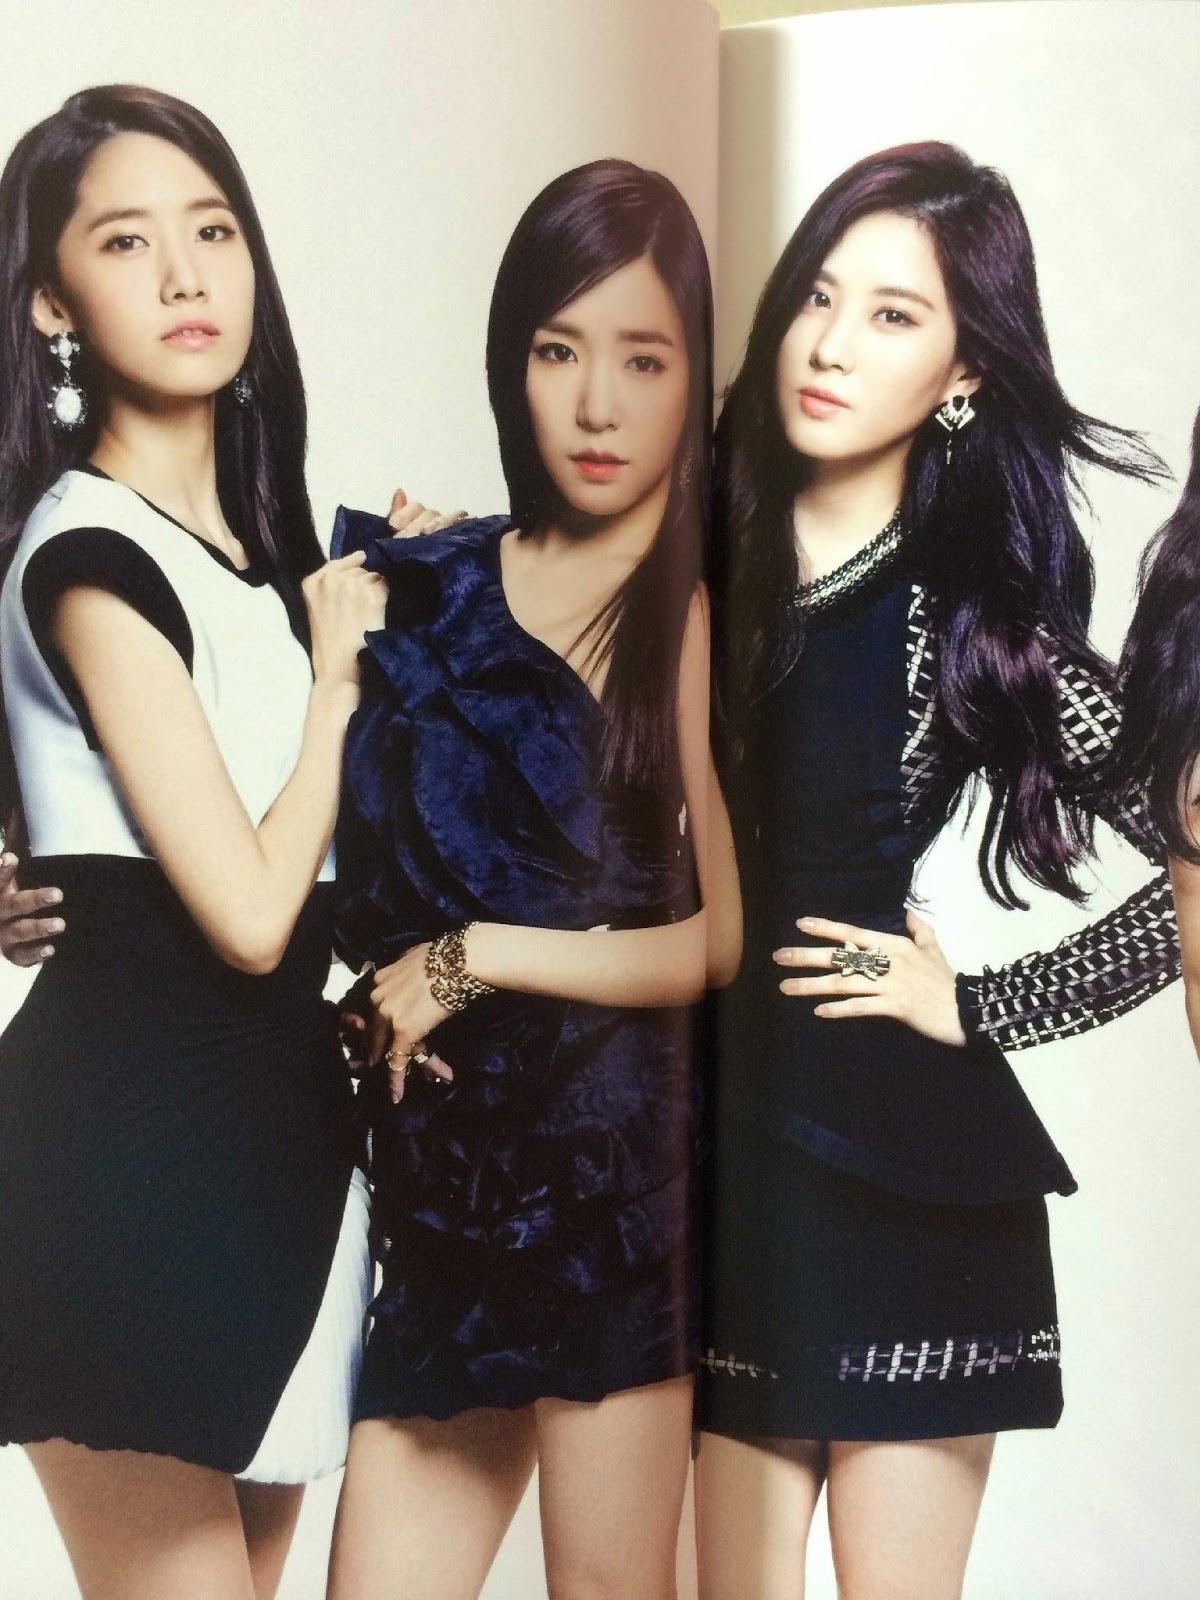 SNSD Girls Generation The Best Scan Photos 5